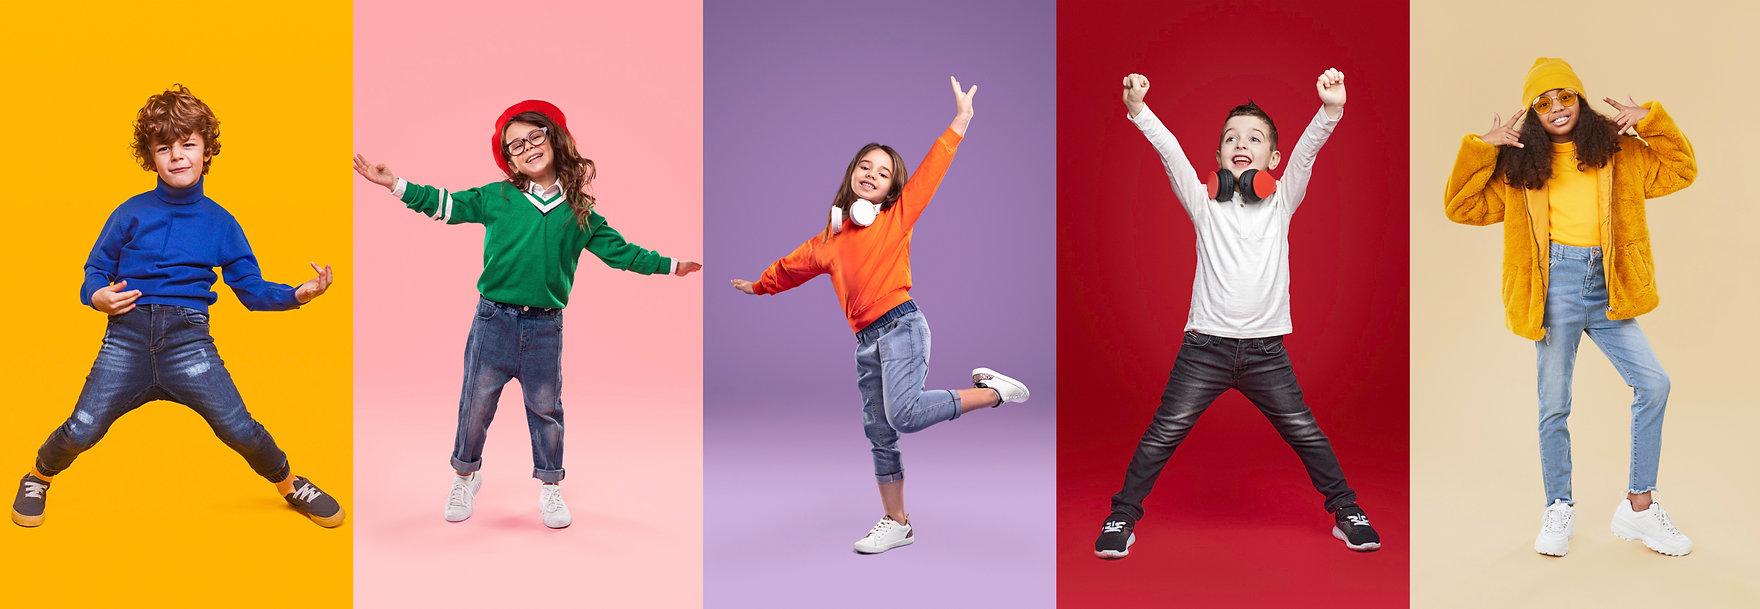 Enfants-mode1.jpg